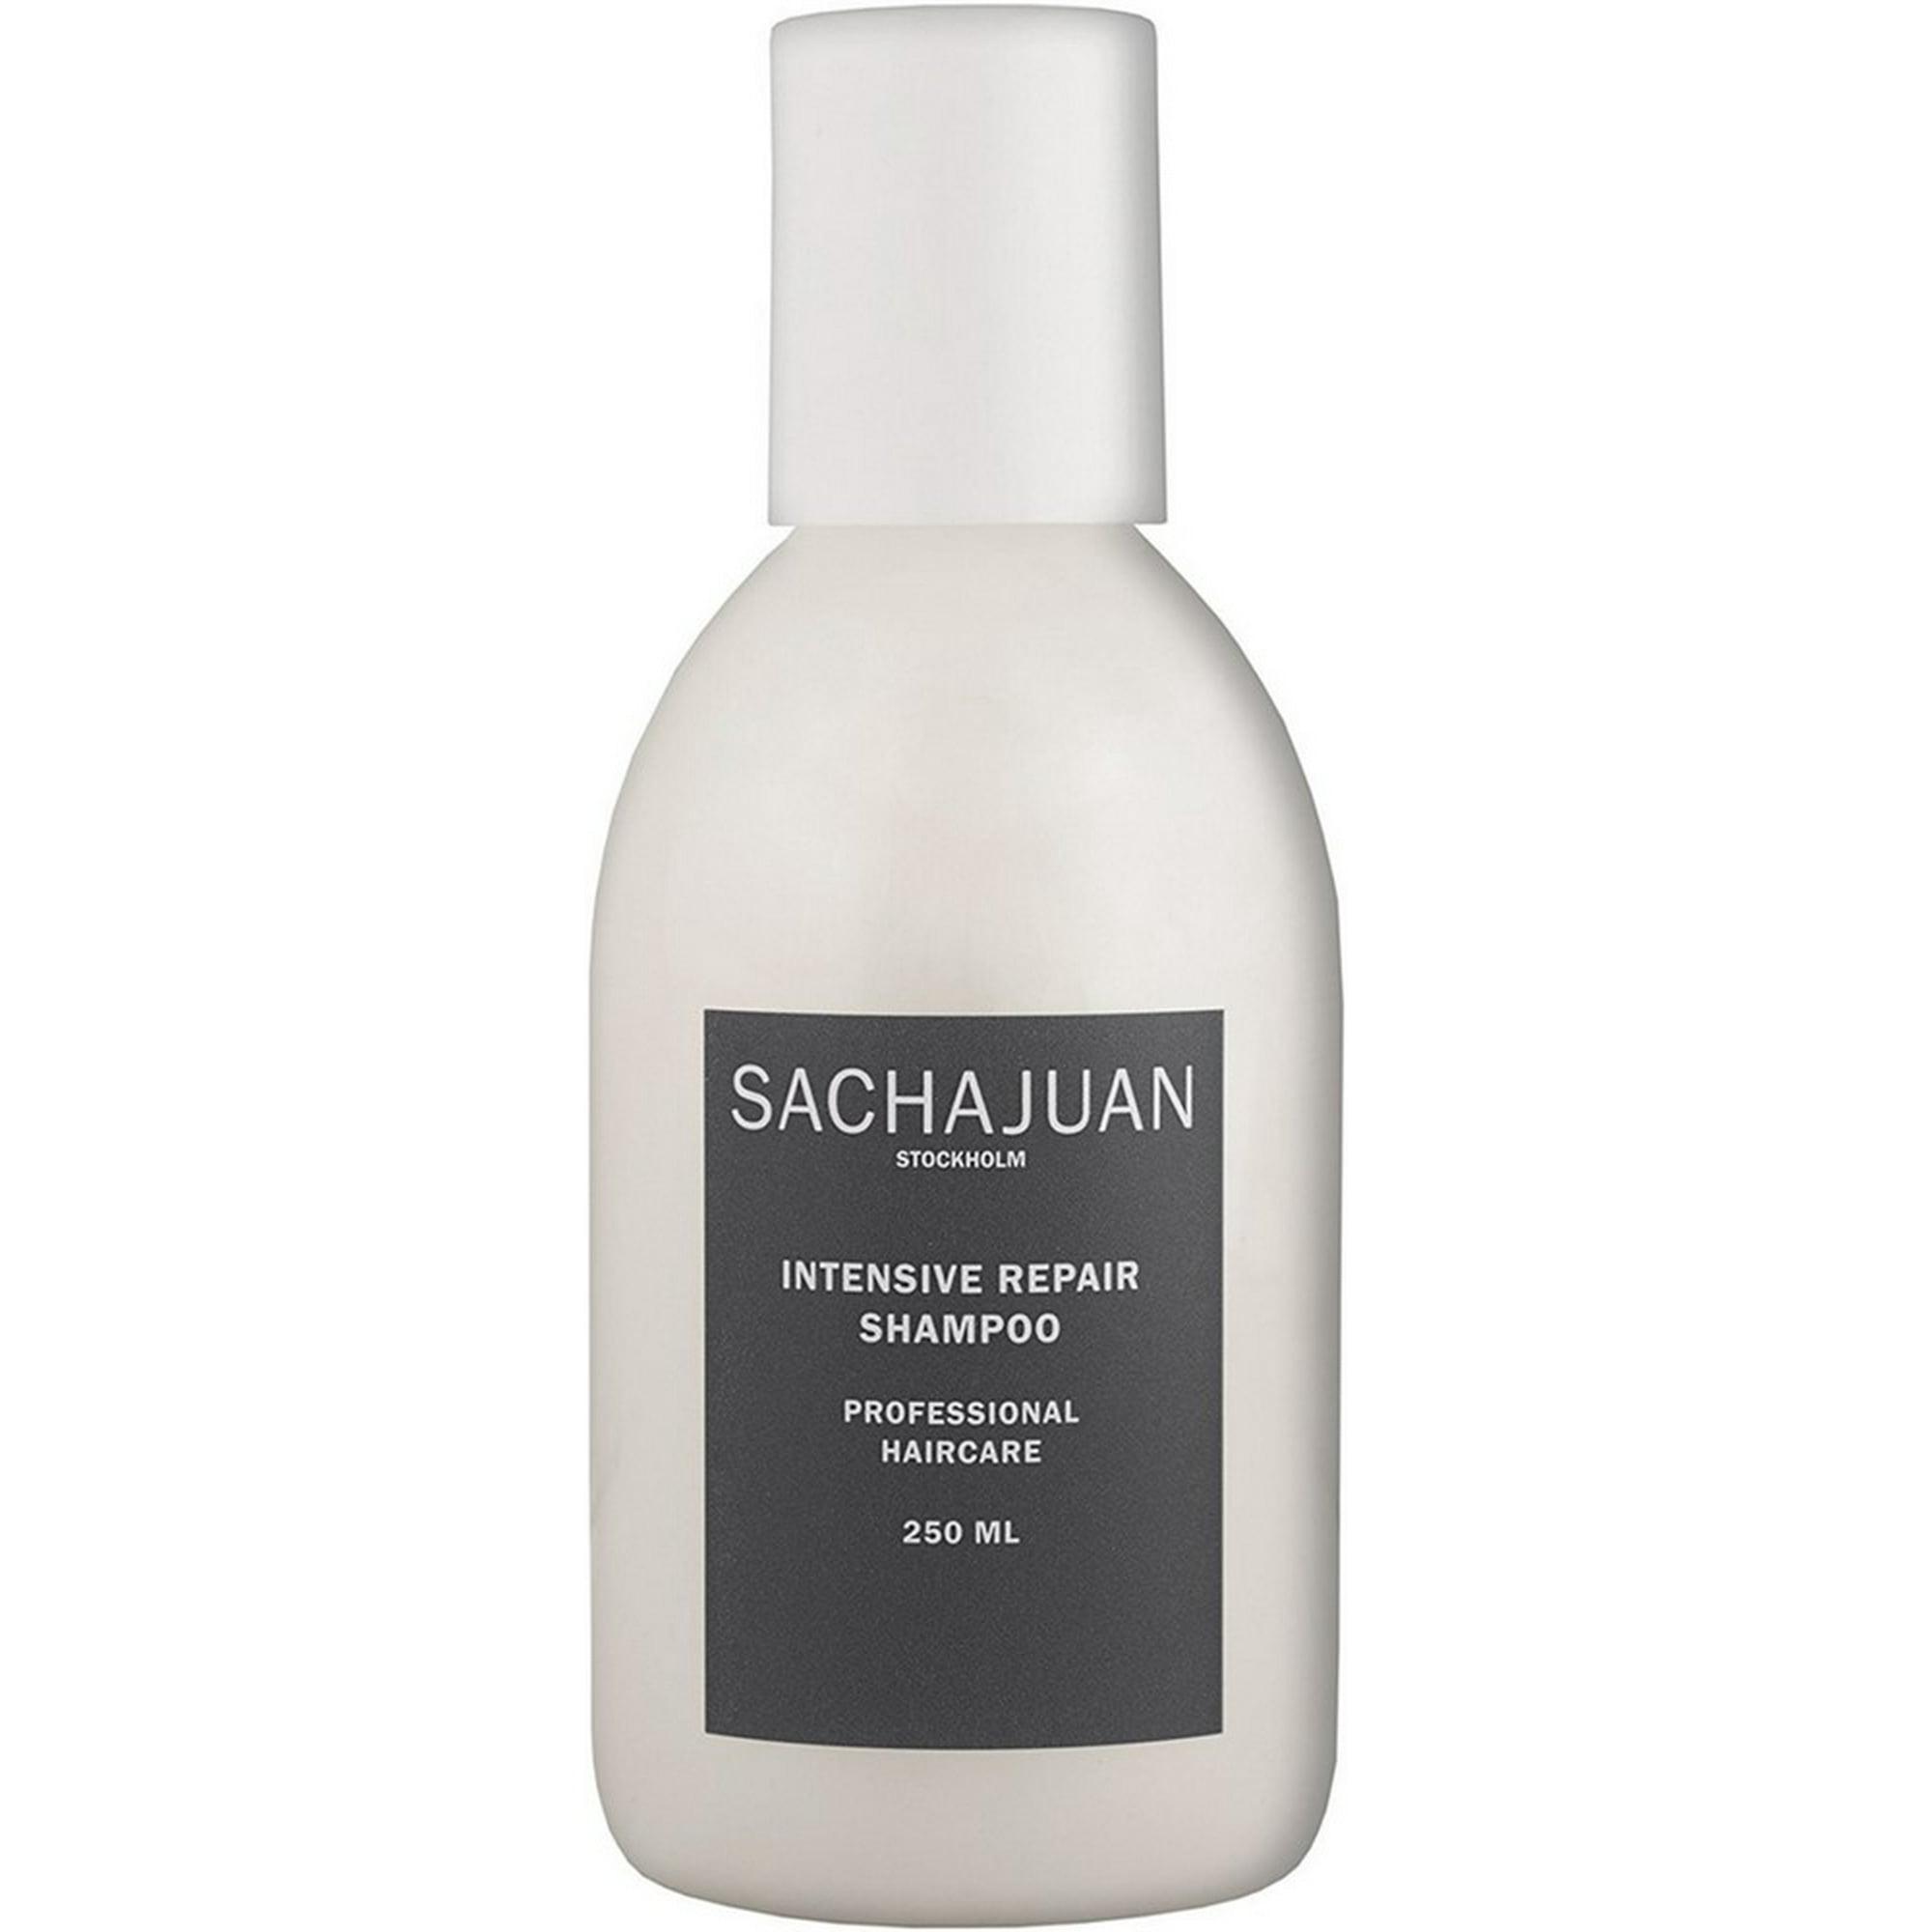 Sachajuan Unisex Haircare Intensive Repair Shampoo 8.45 Oz Hair Care Elegant Appearance Health & Beauty Anti-aging Products